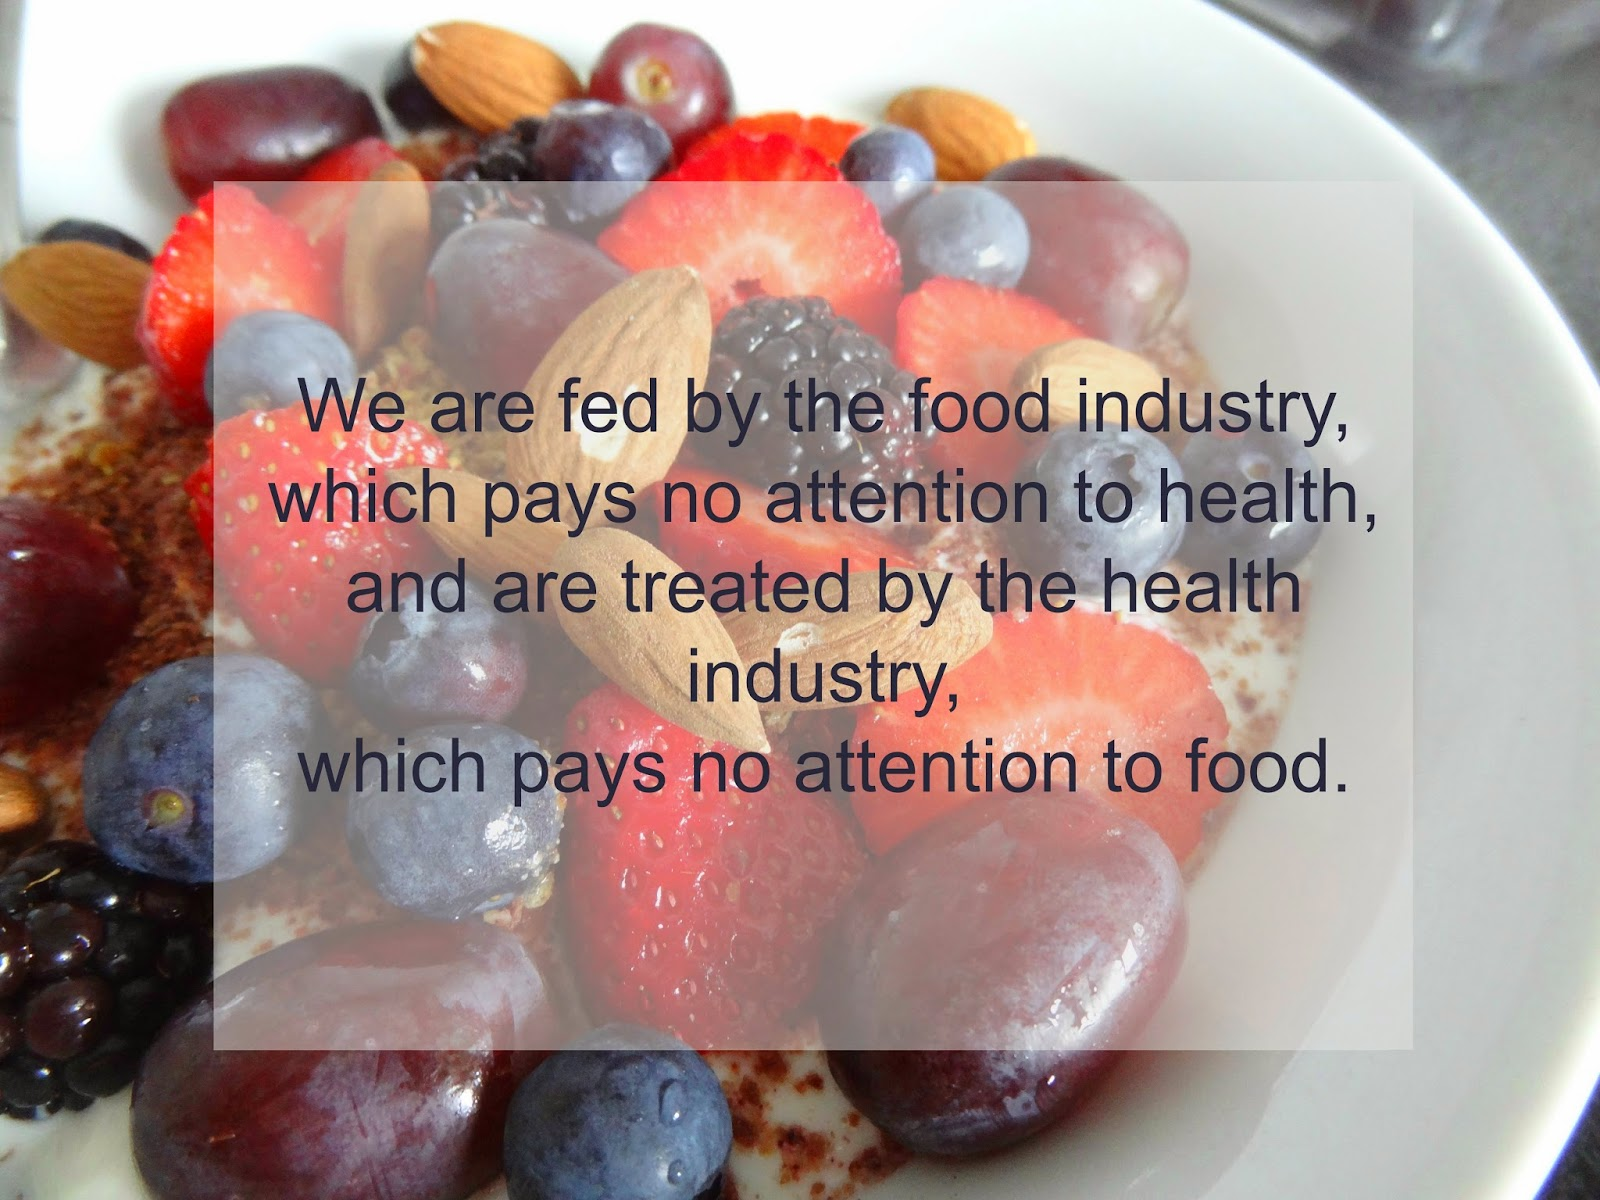 TBE+Nutrition+Health+Food+Industry.jpg